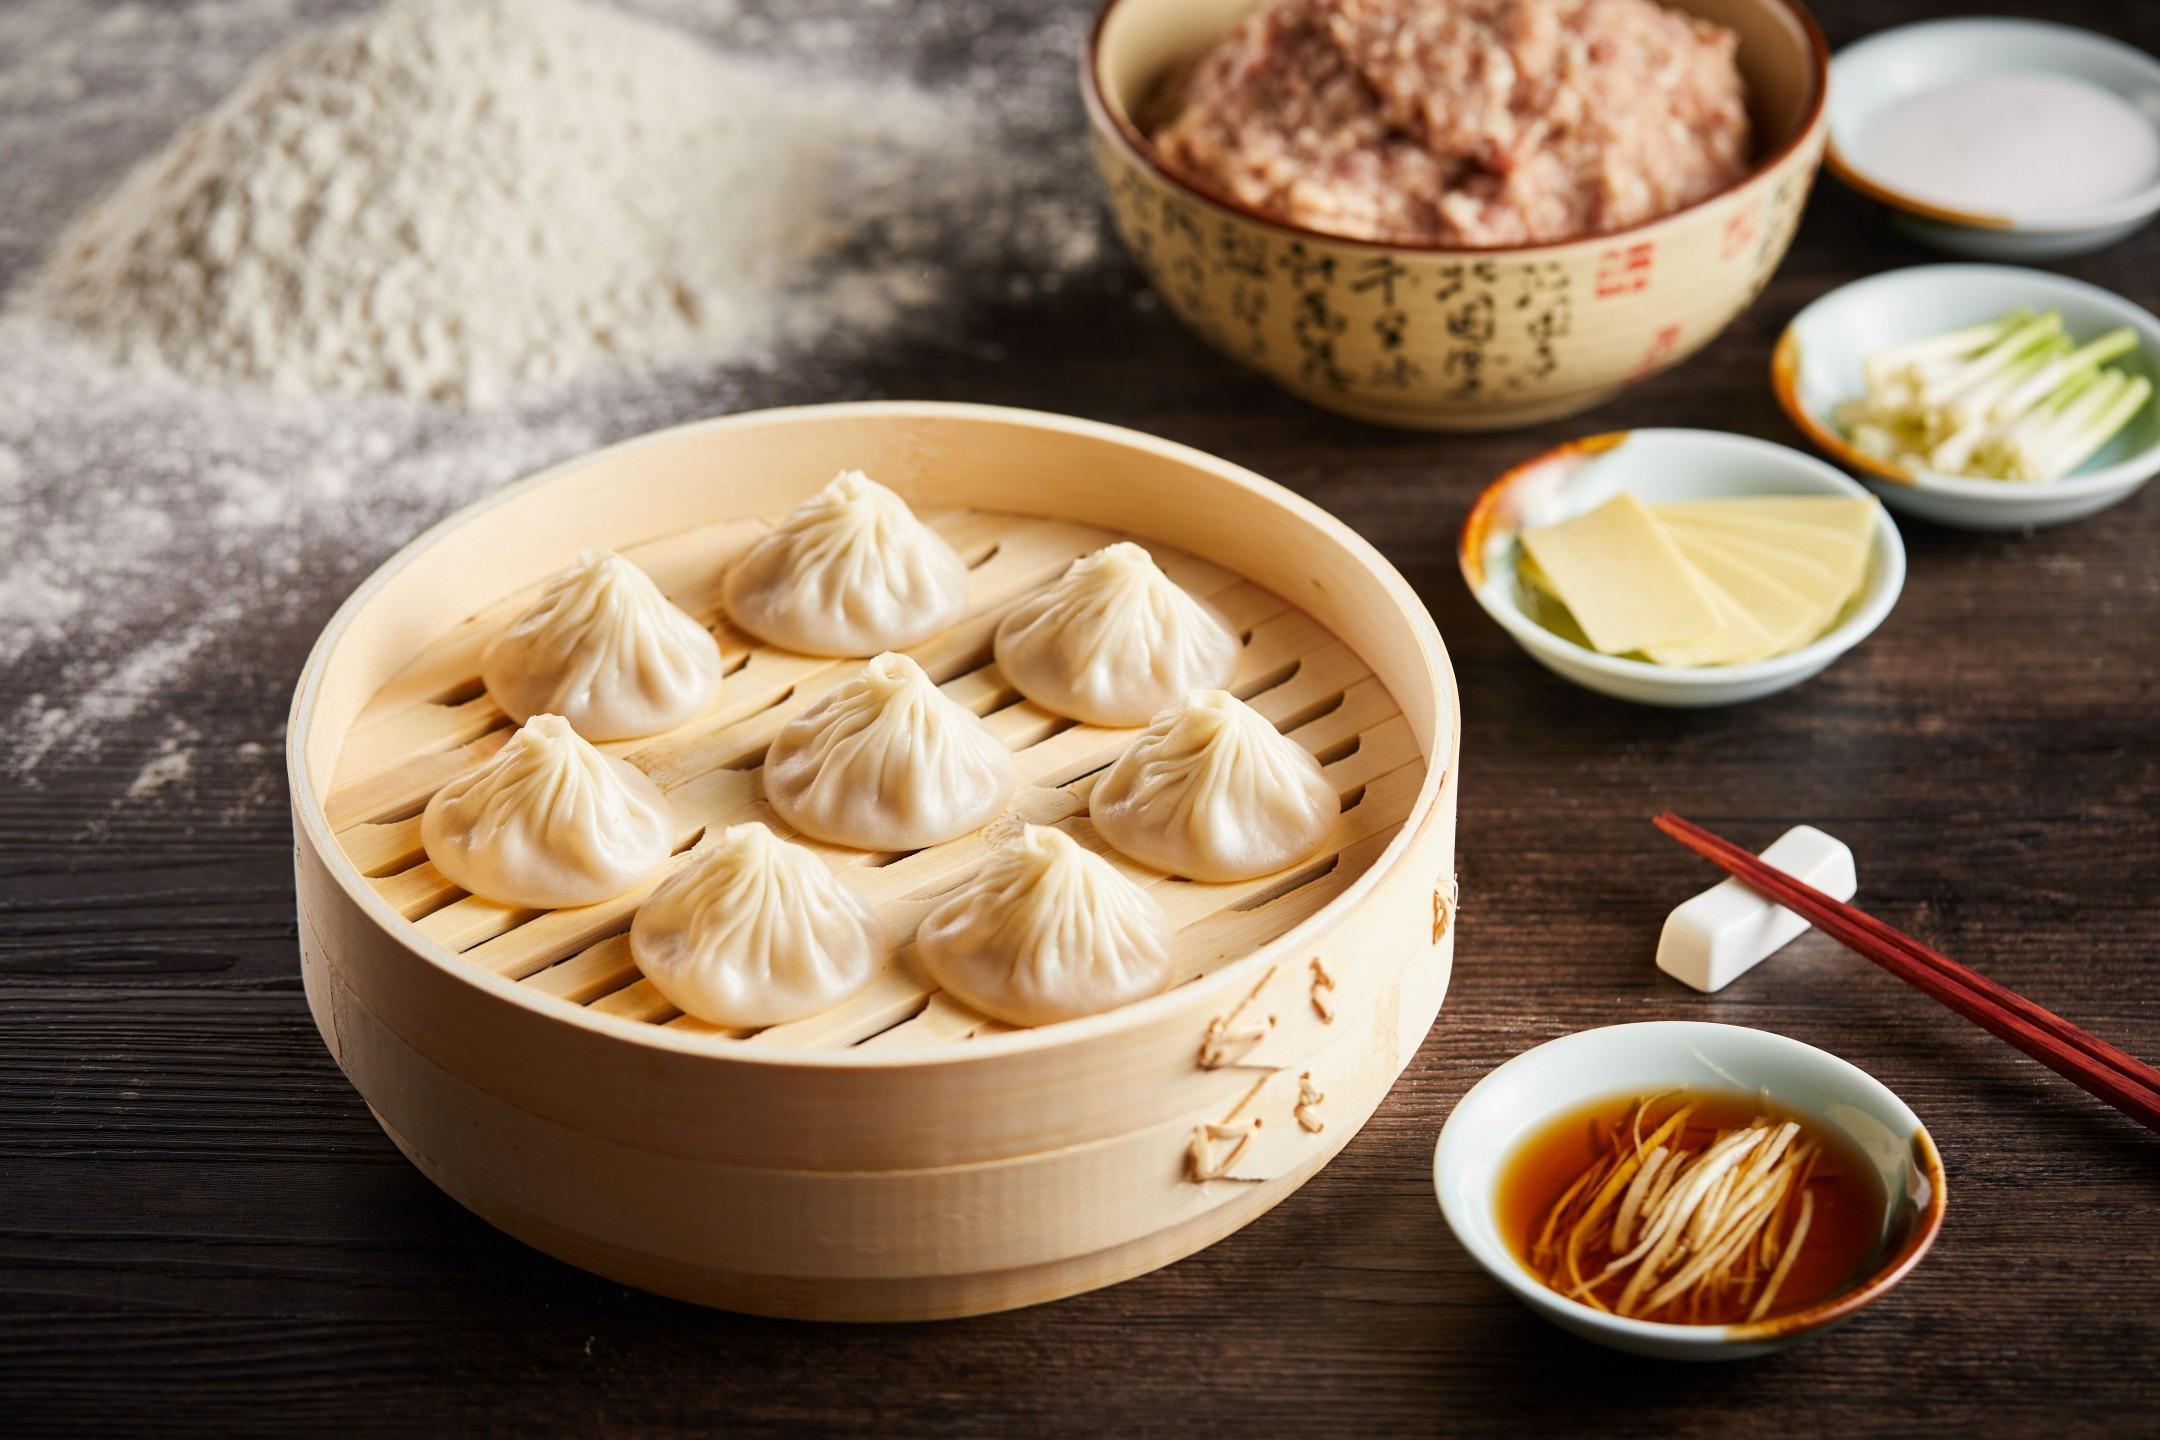 squarerooms-paradise-group-restaurants-dim-sum-food-photography-chinese-cuisine-table-set